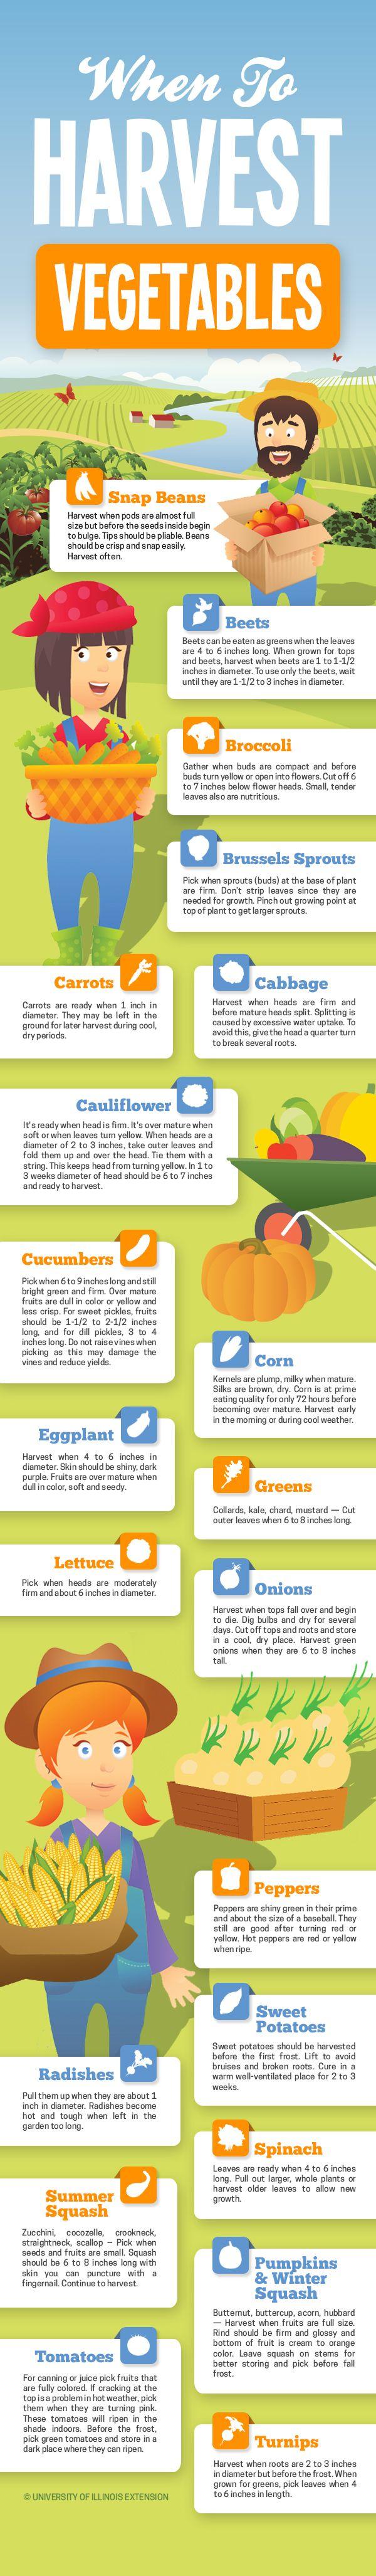 "Handy infographic for gardeners! ""When to Harvest Vegetables"" #garden #produce #veggies"